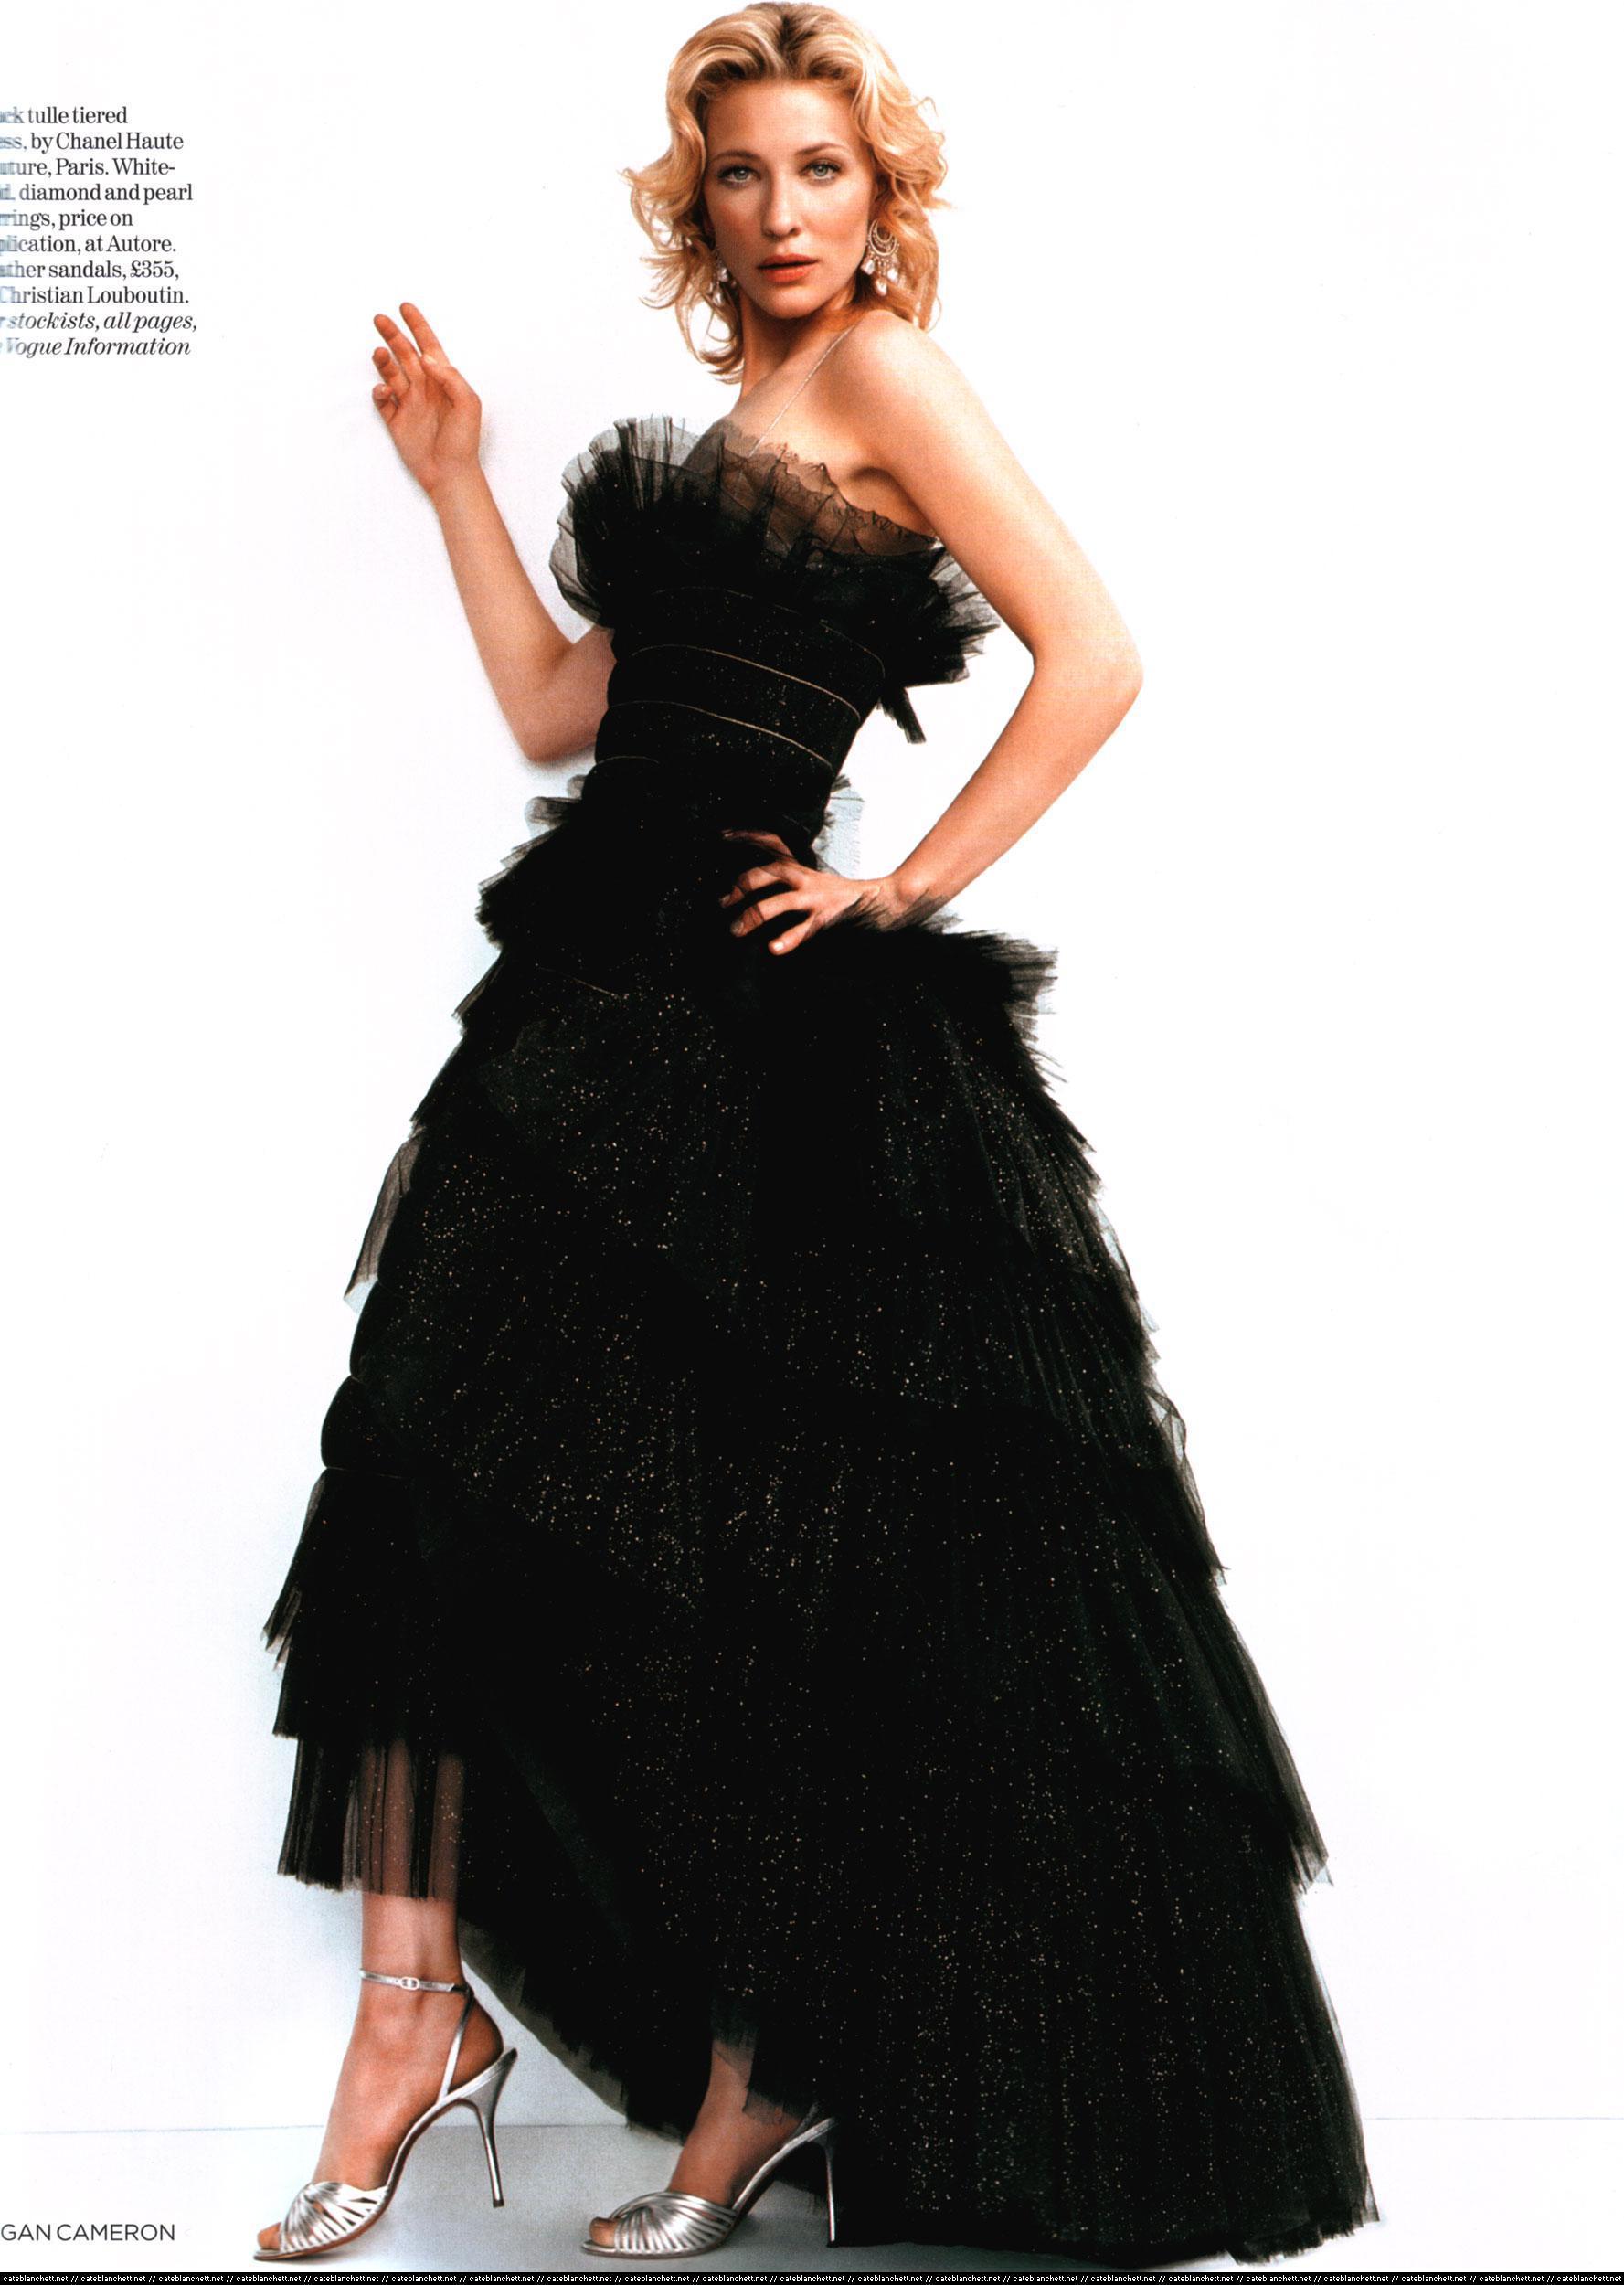 Cate Blanchett fotos calientes